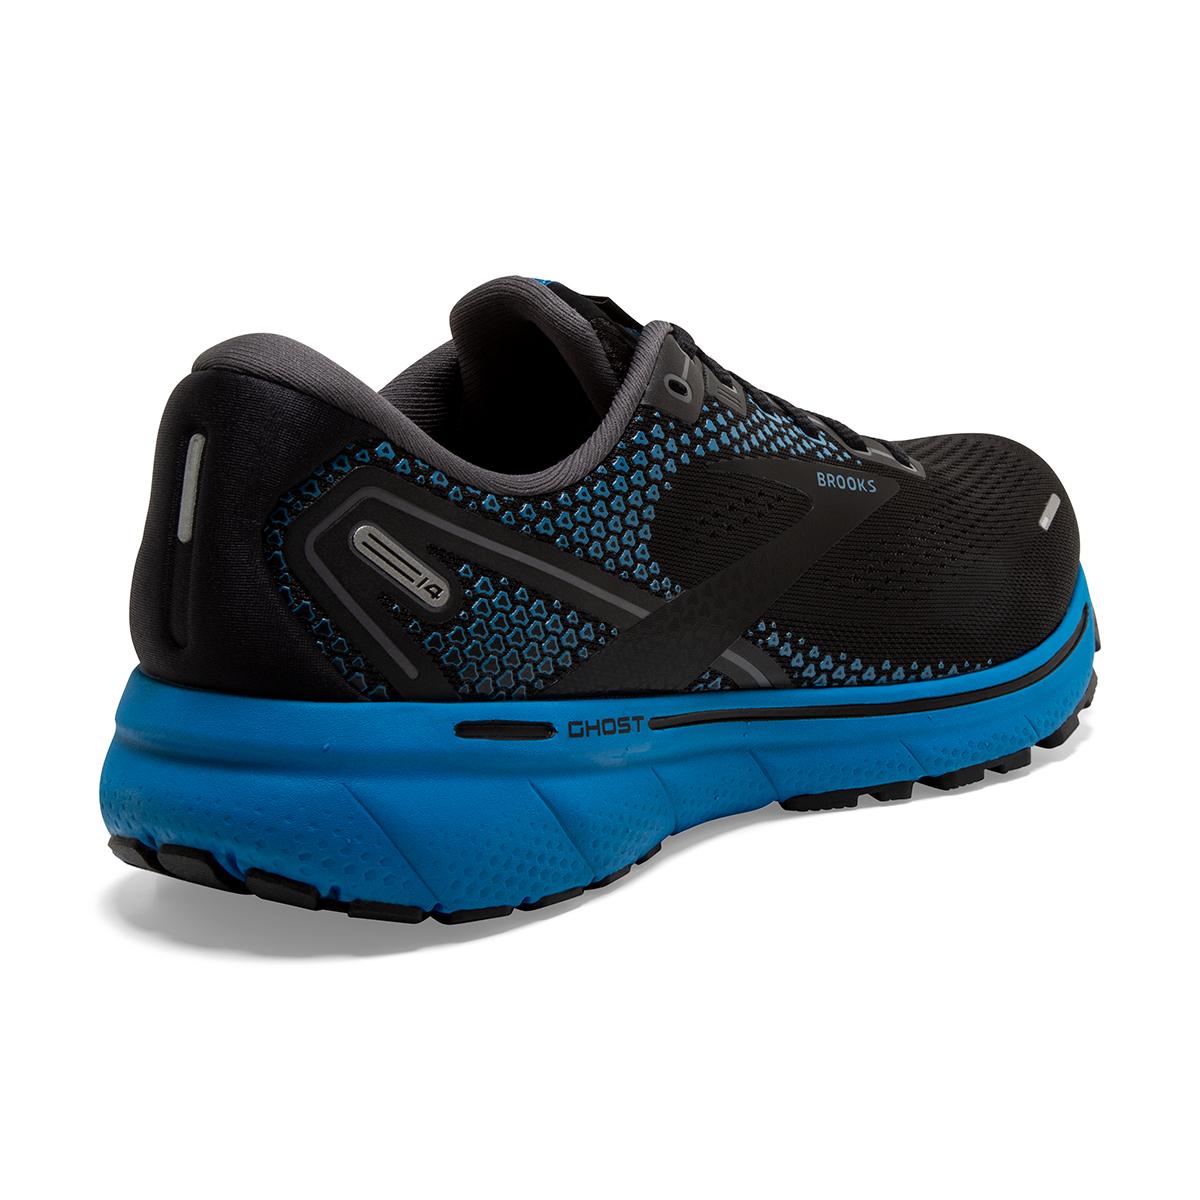 Men's Brooks Ghost 14 Running Shoe, , large, image 6